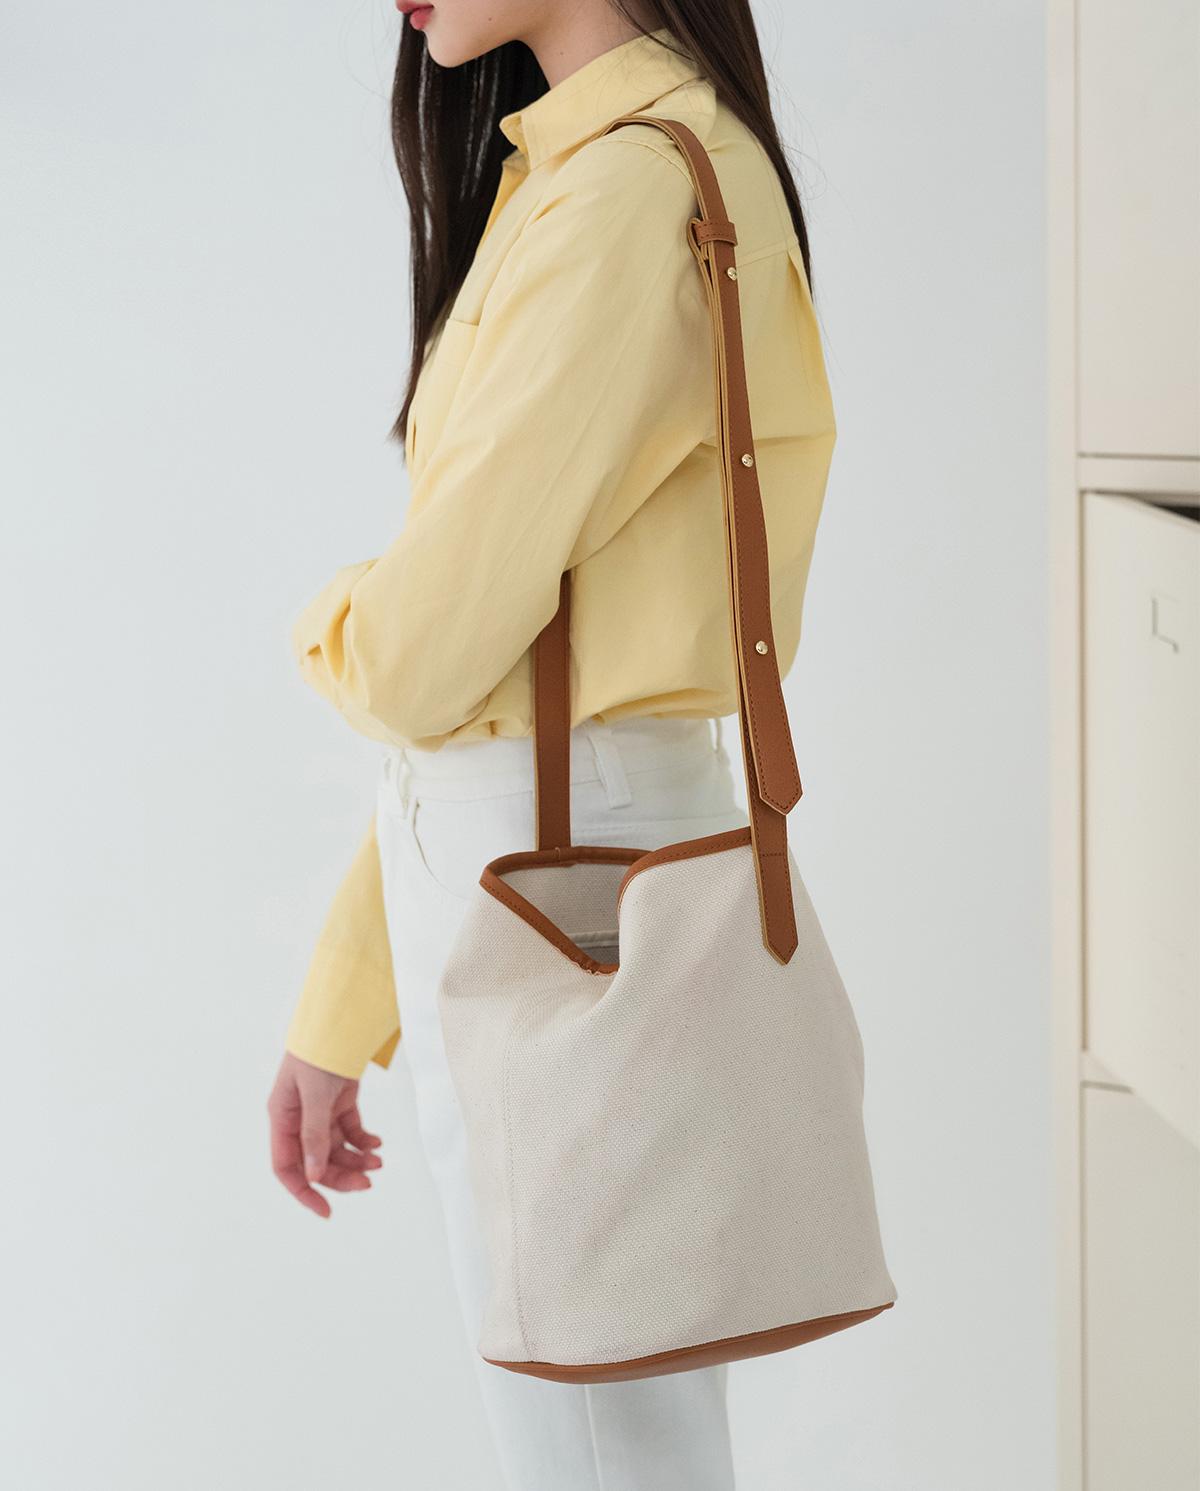 simple canvas bag